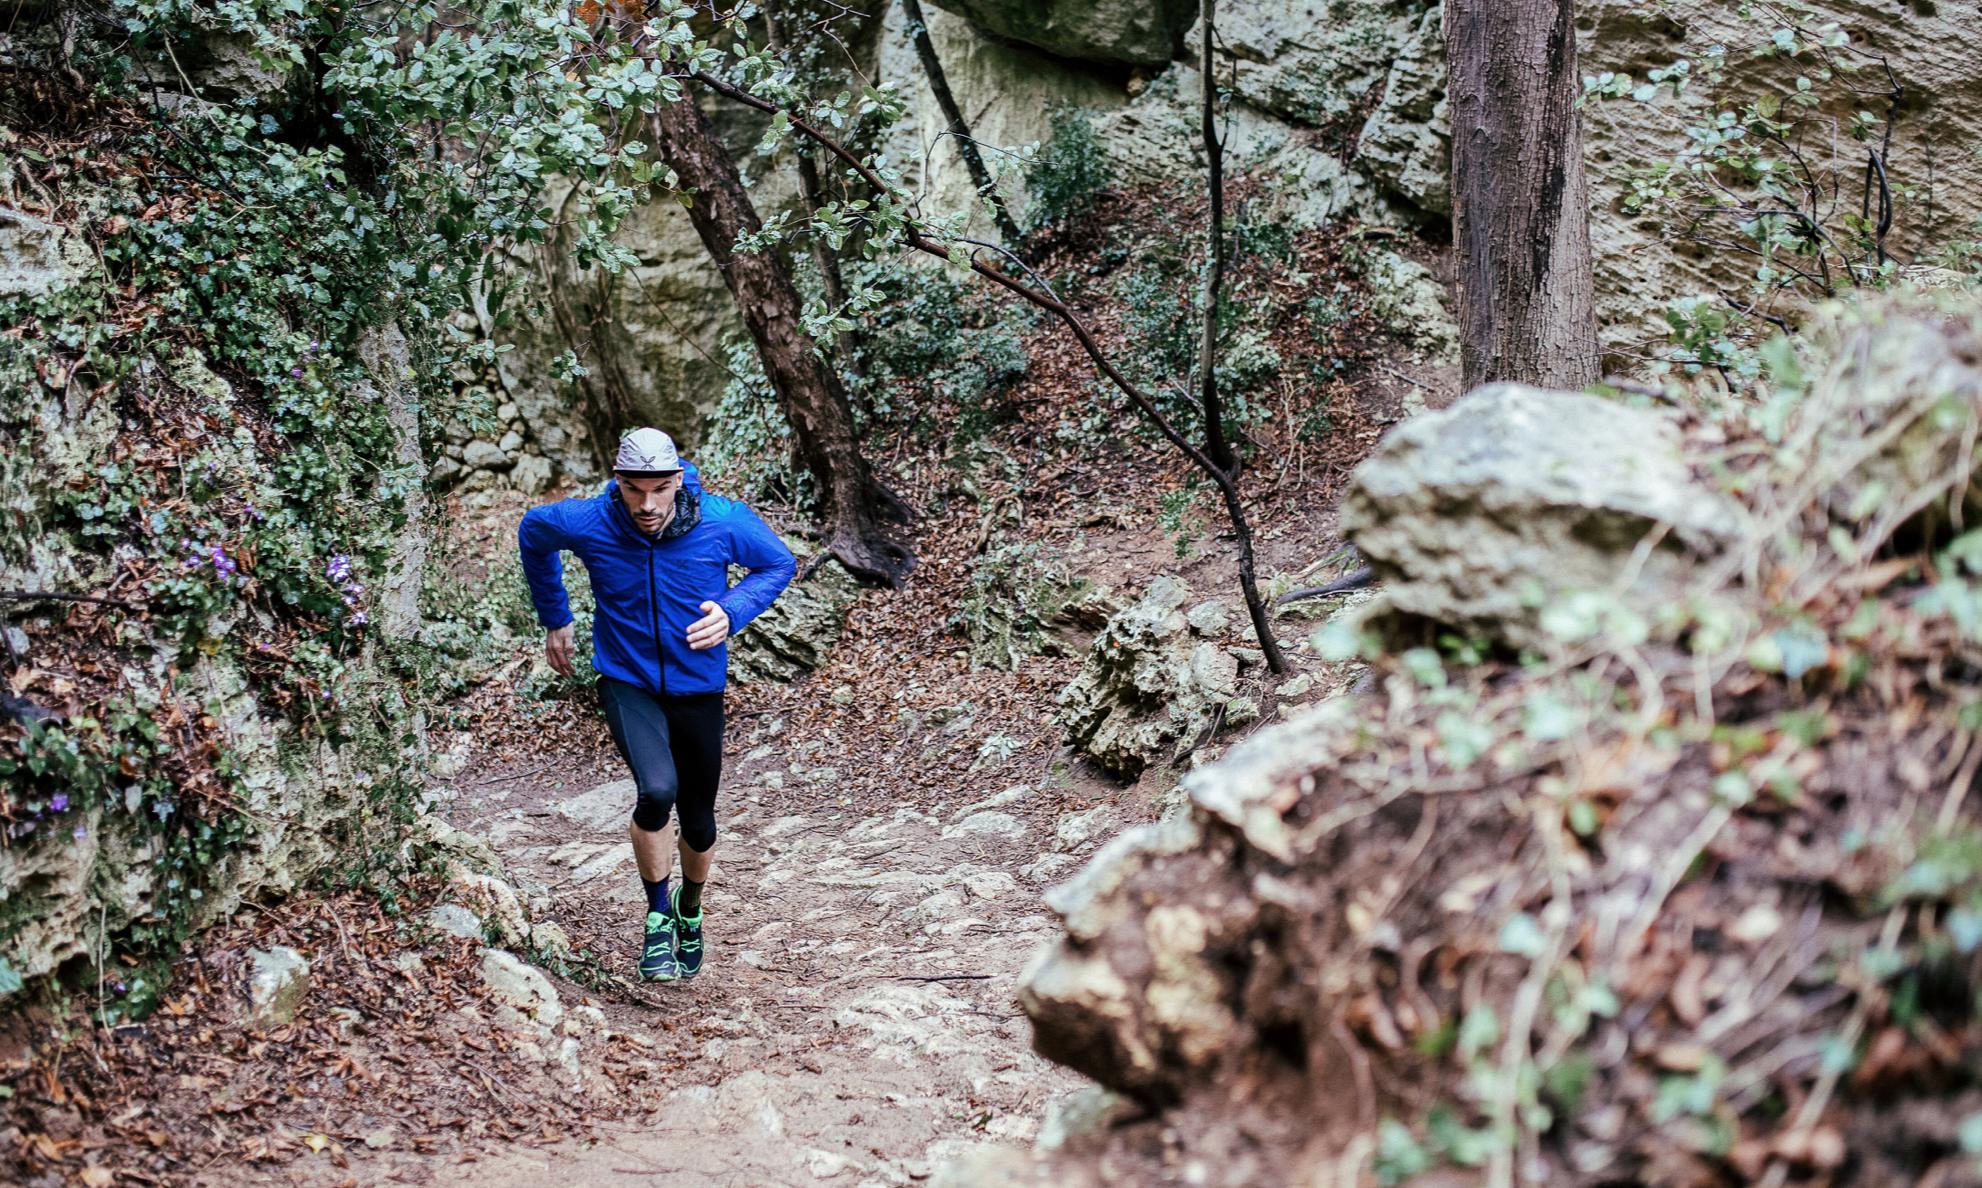 Calendario Running.On Line Il Calendario Delle Gare Outdoor Running 2019 Skialper